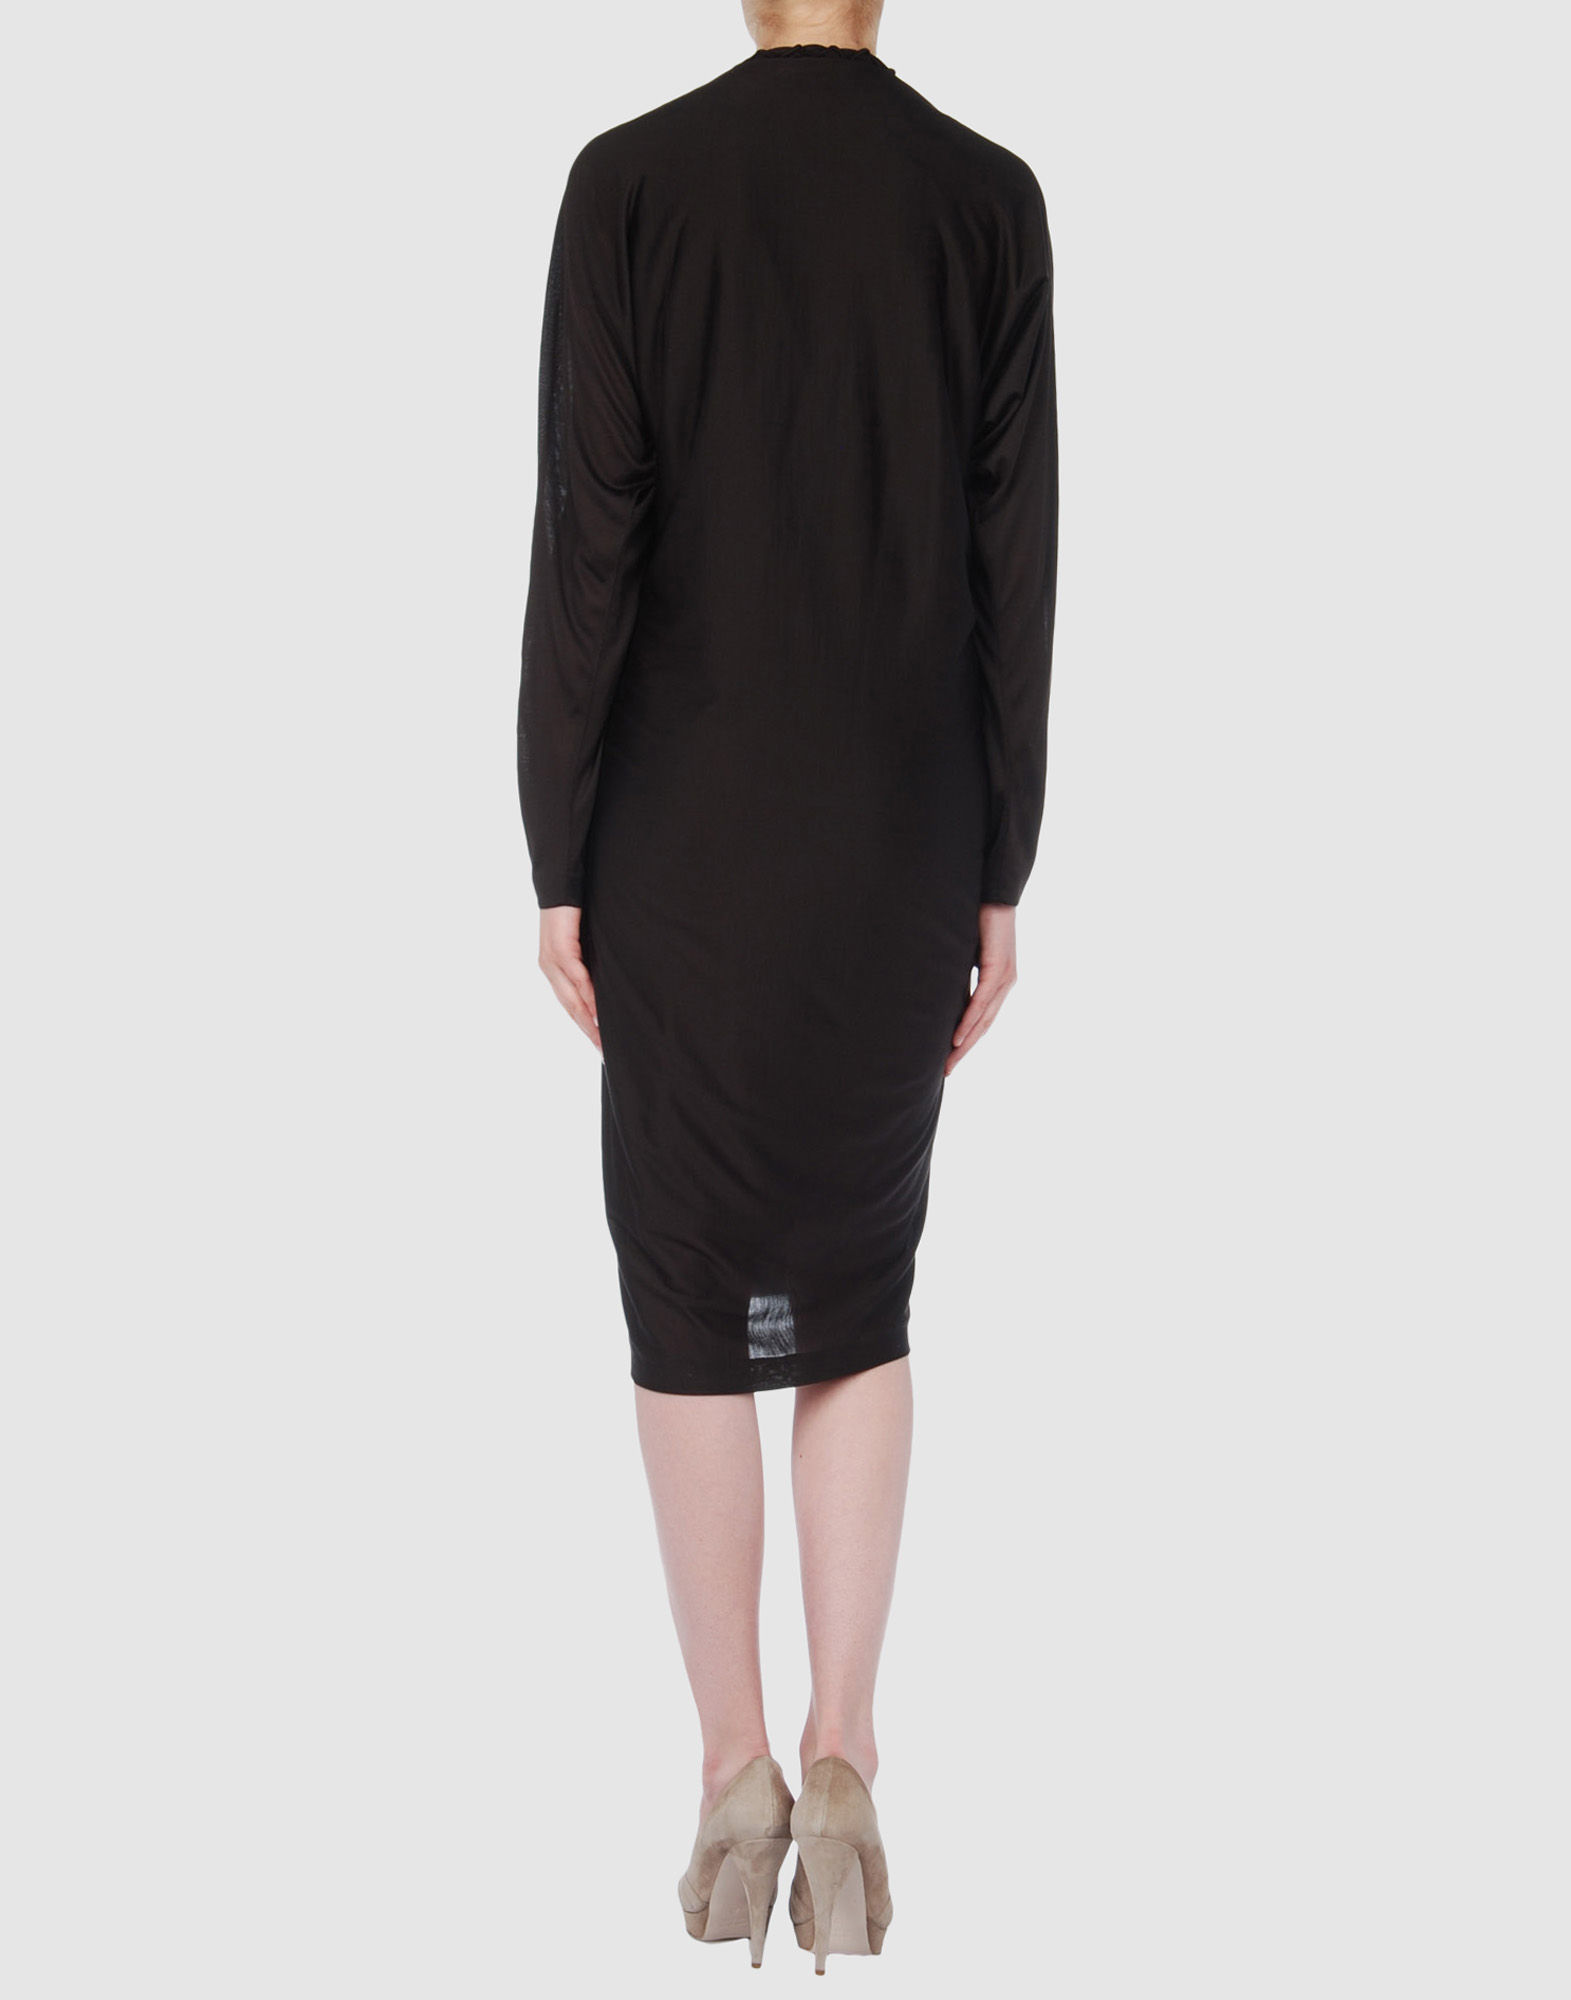 34220338CB 14 r - Βραδυνα Φορεματα Yves Saint Laurent Rive Gauche Κωδ.29